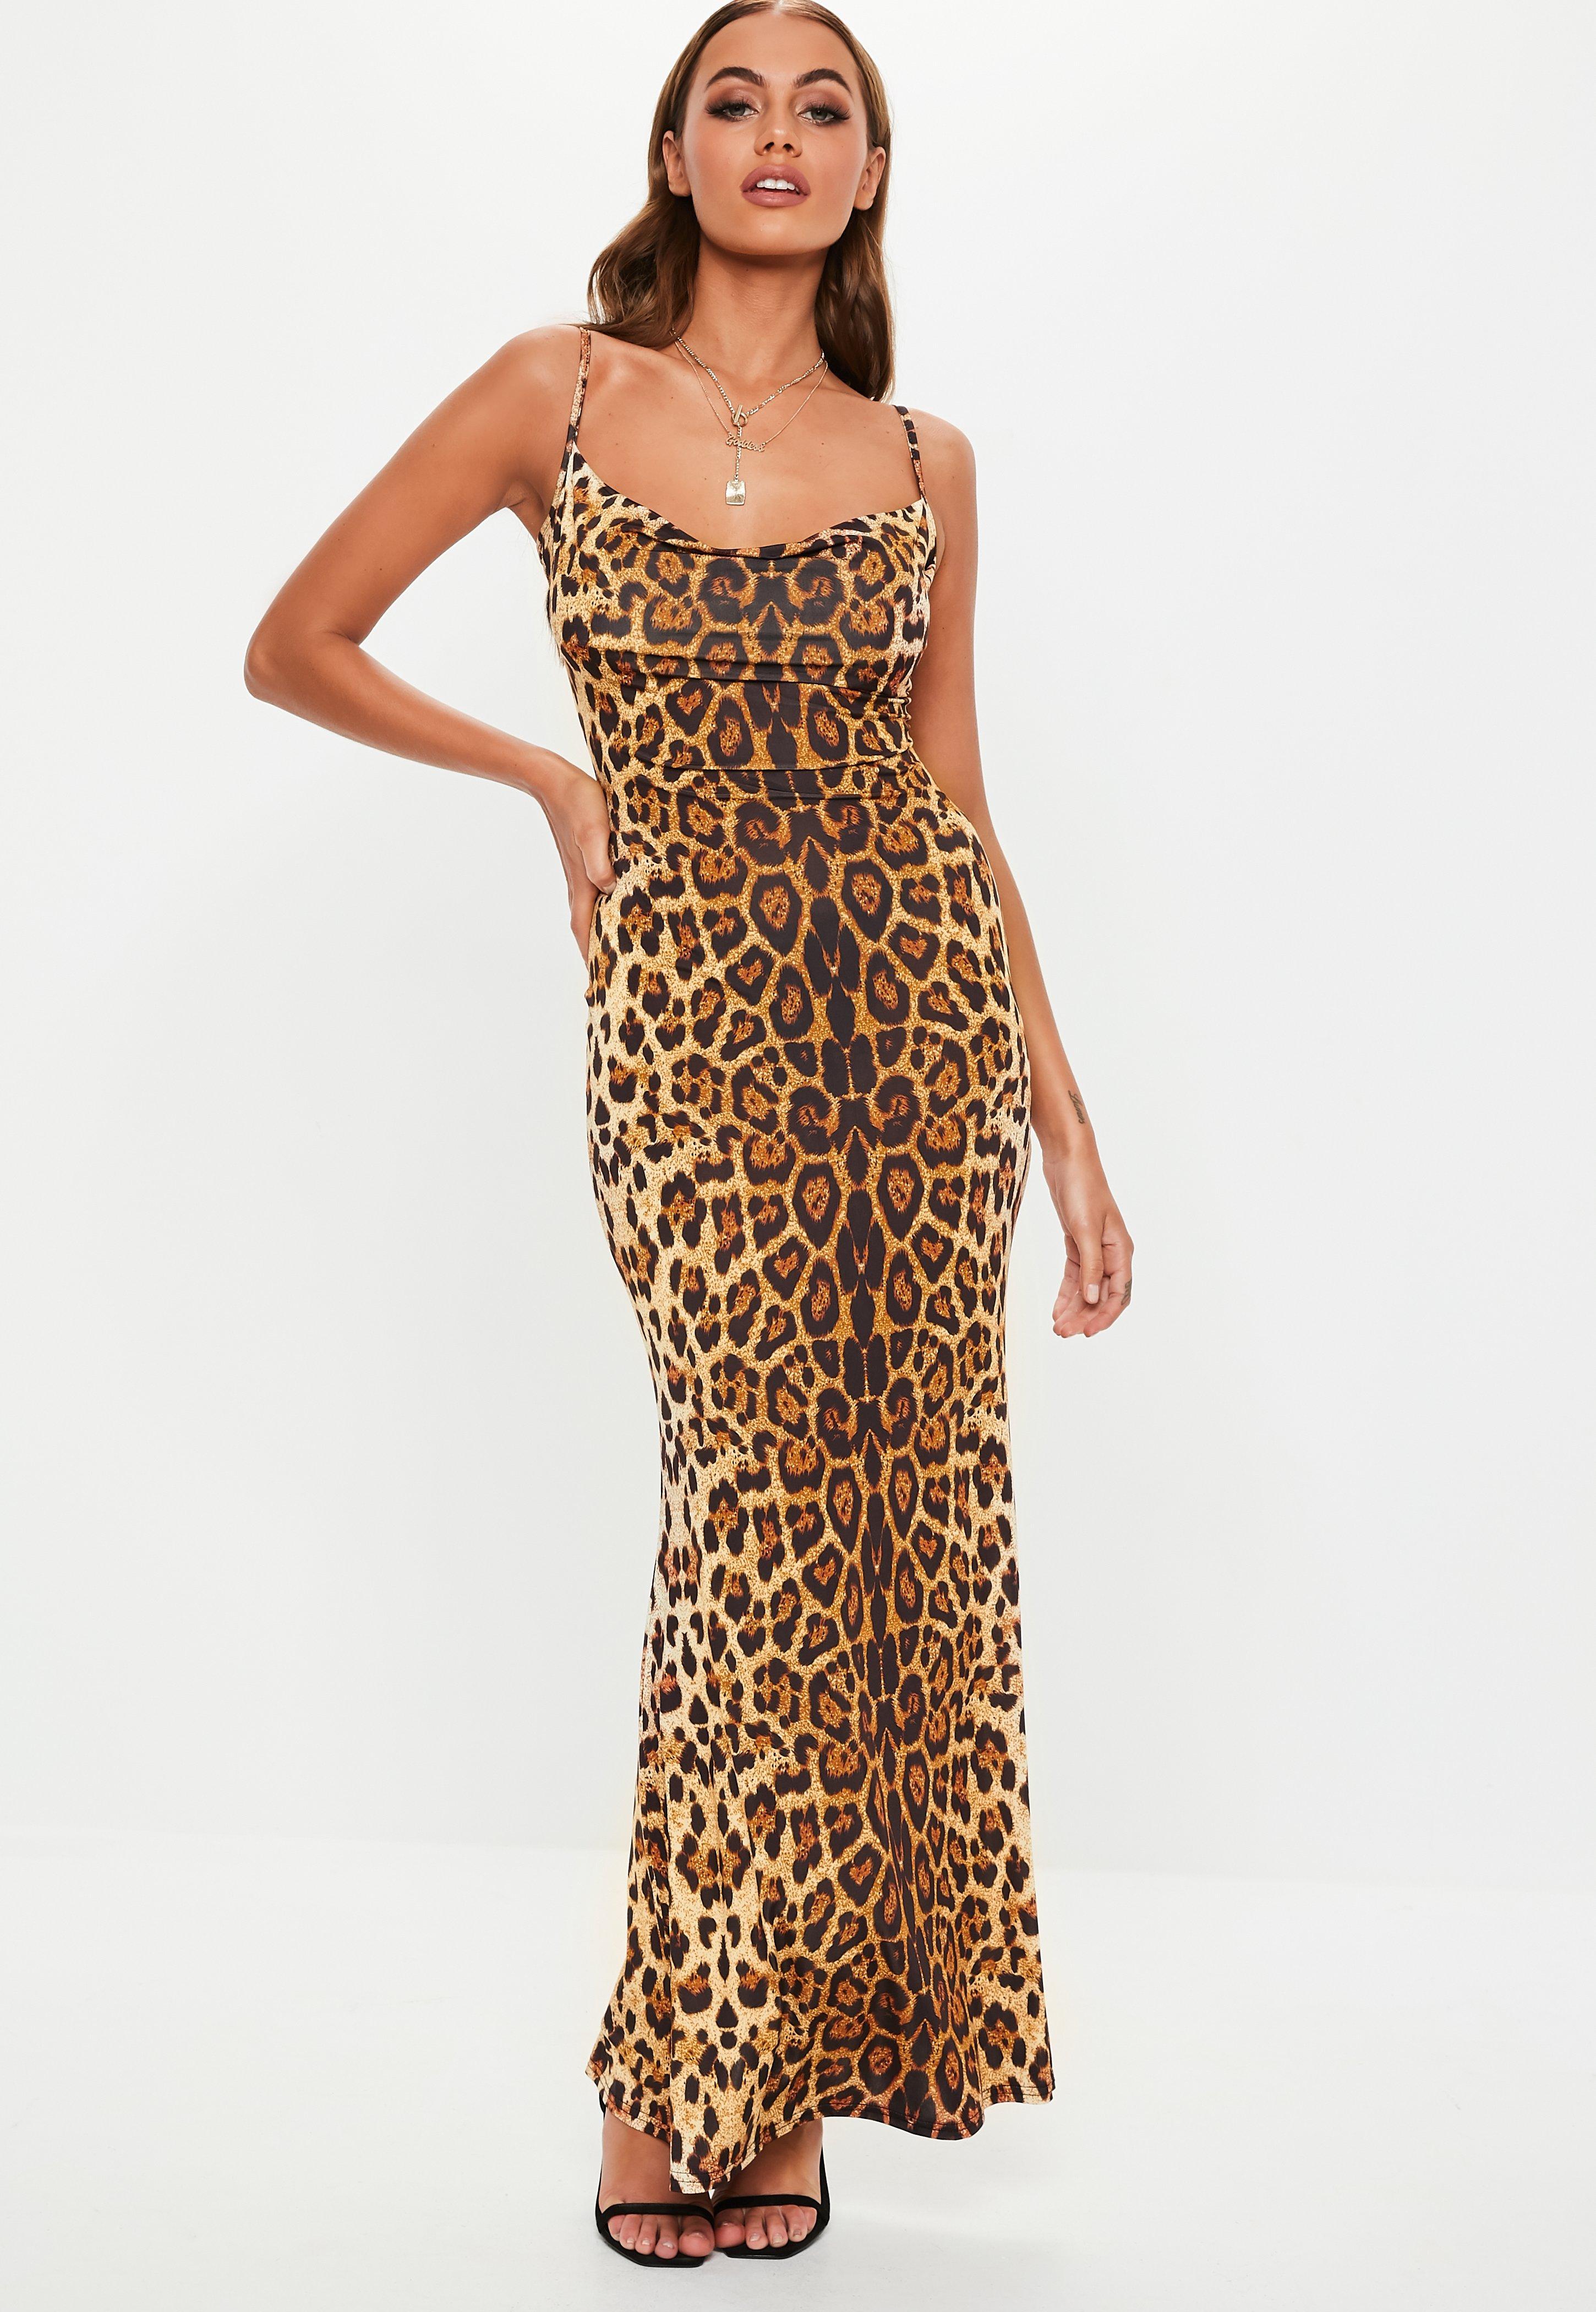 79b386685382 Slip Dresses | Shop Cami Dresses - Missguided